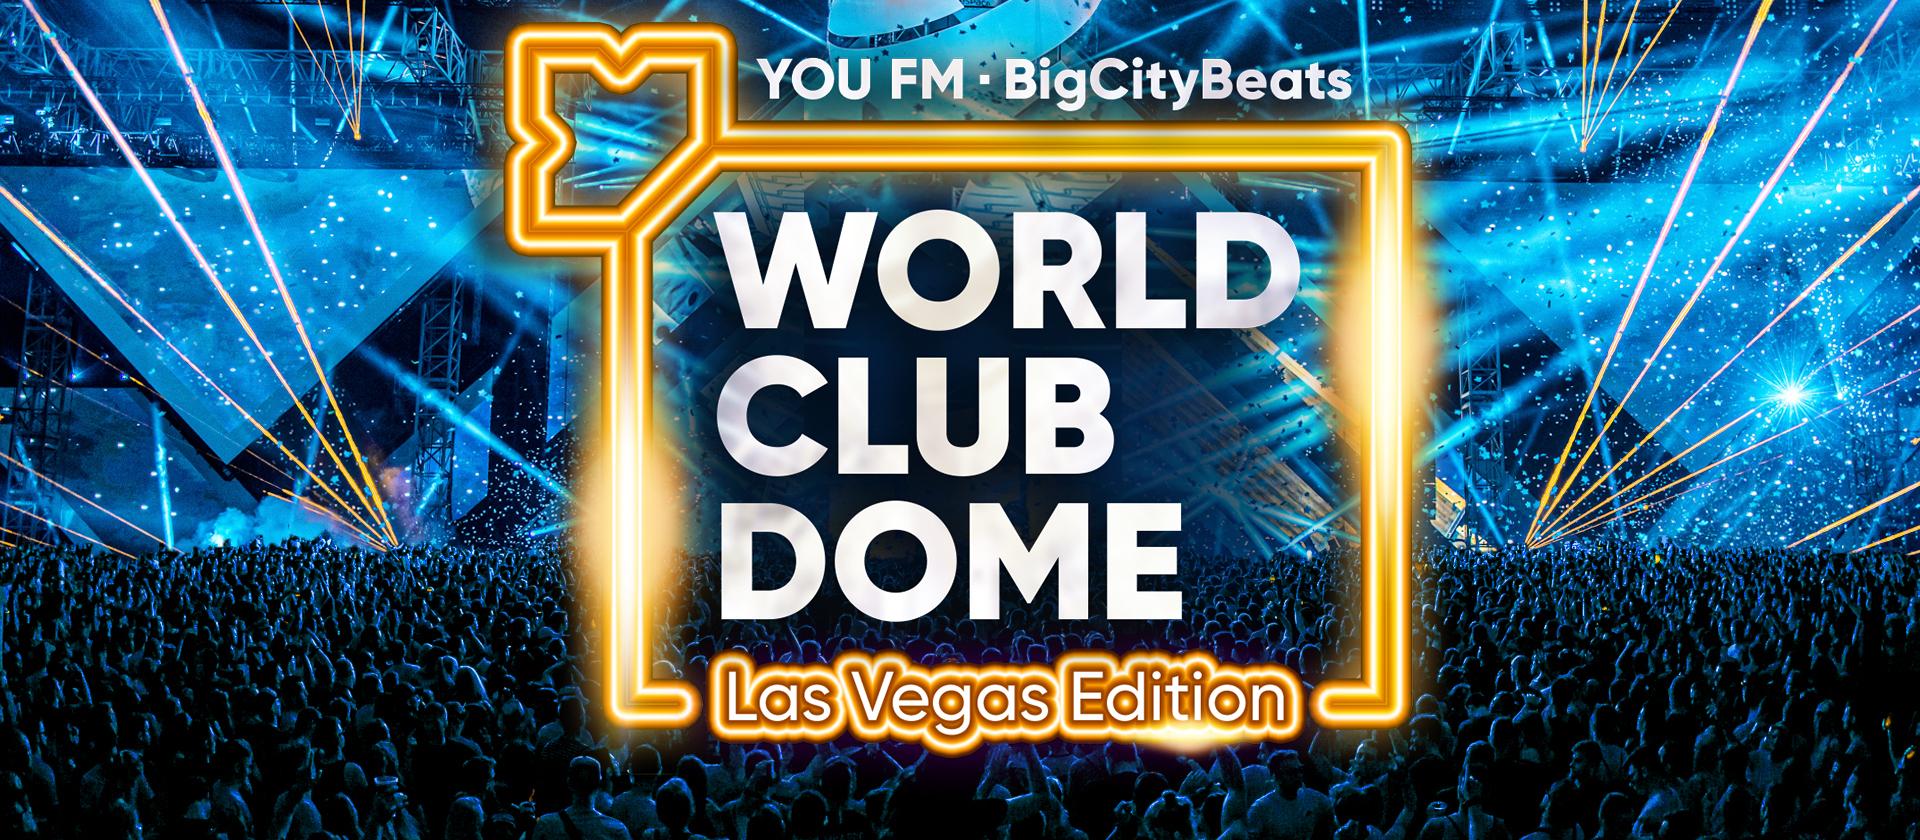 World Club Dome Las Vegas Edition